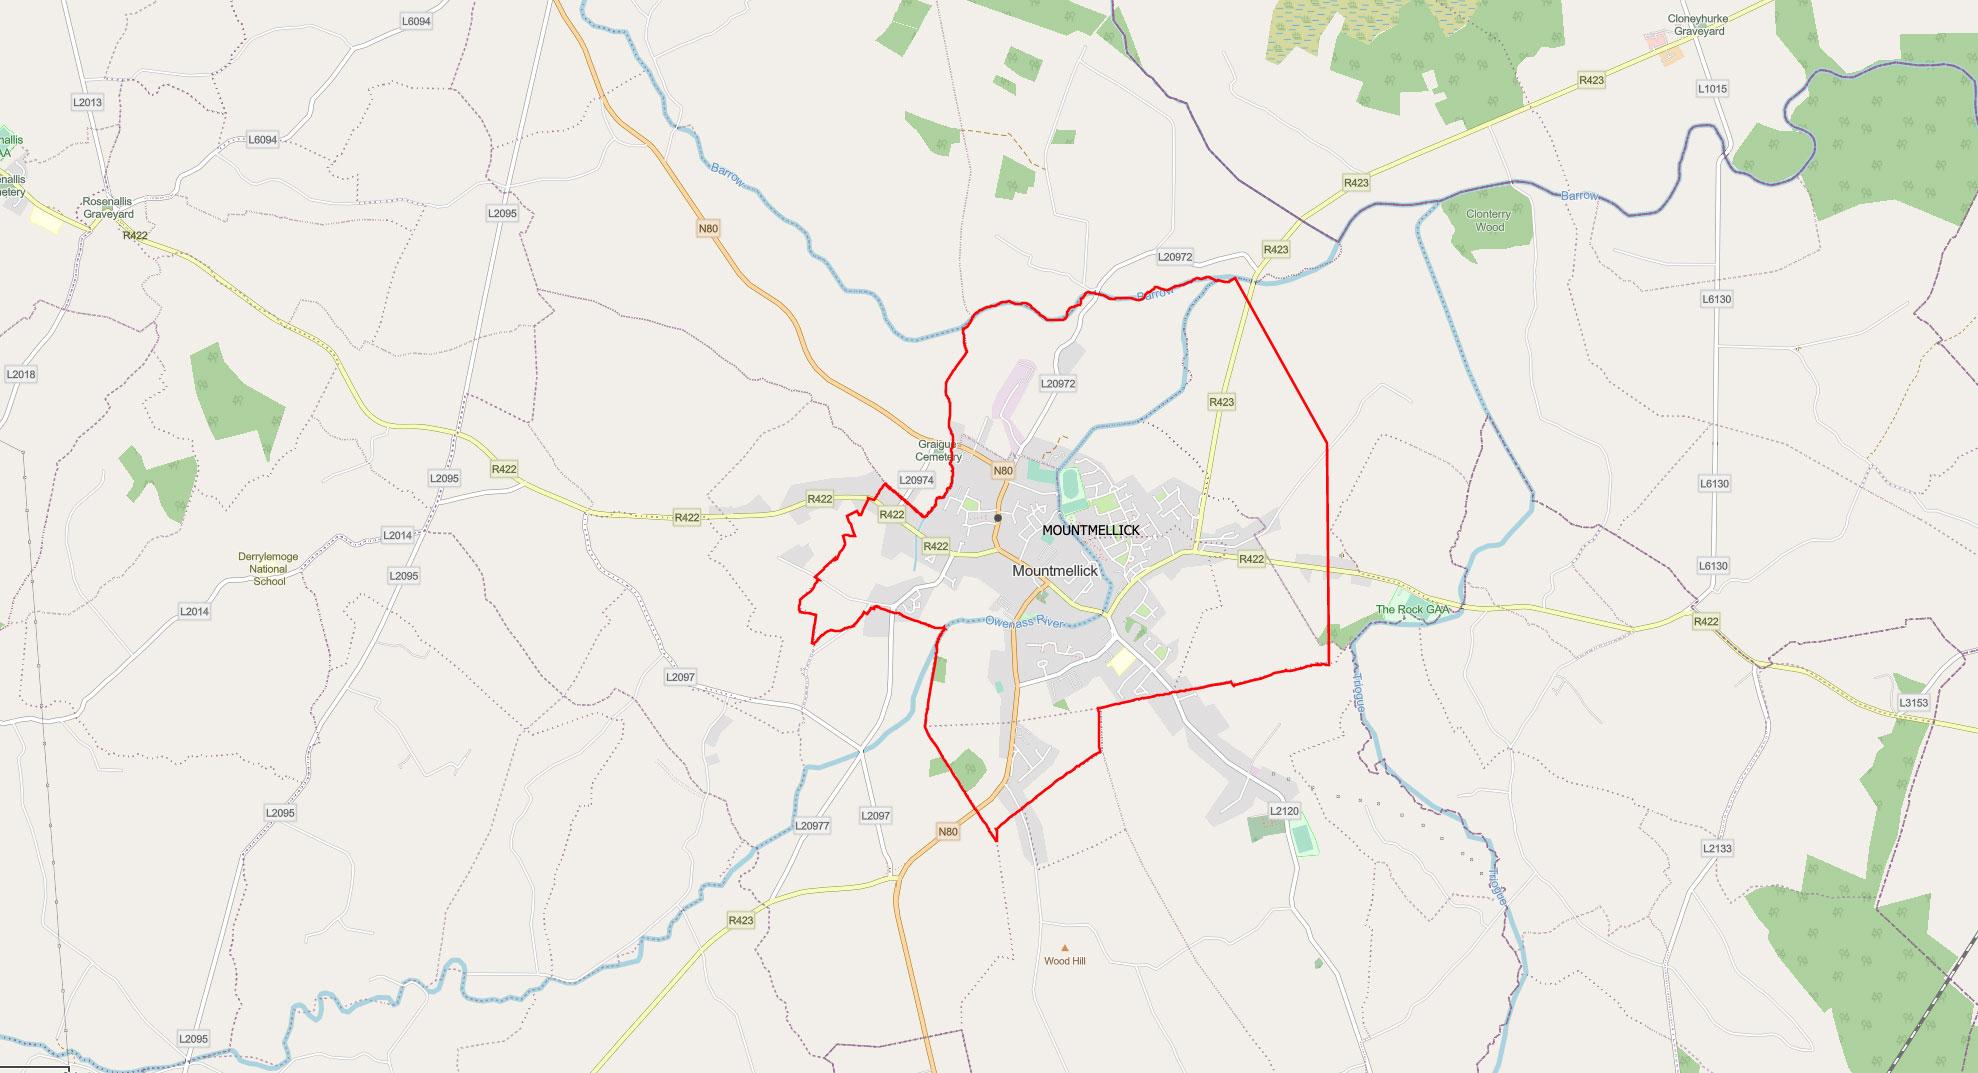 Solar-panels-mountmellick-laois-ireland-map-img